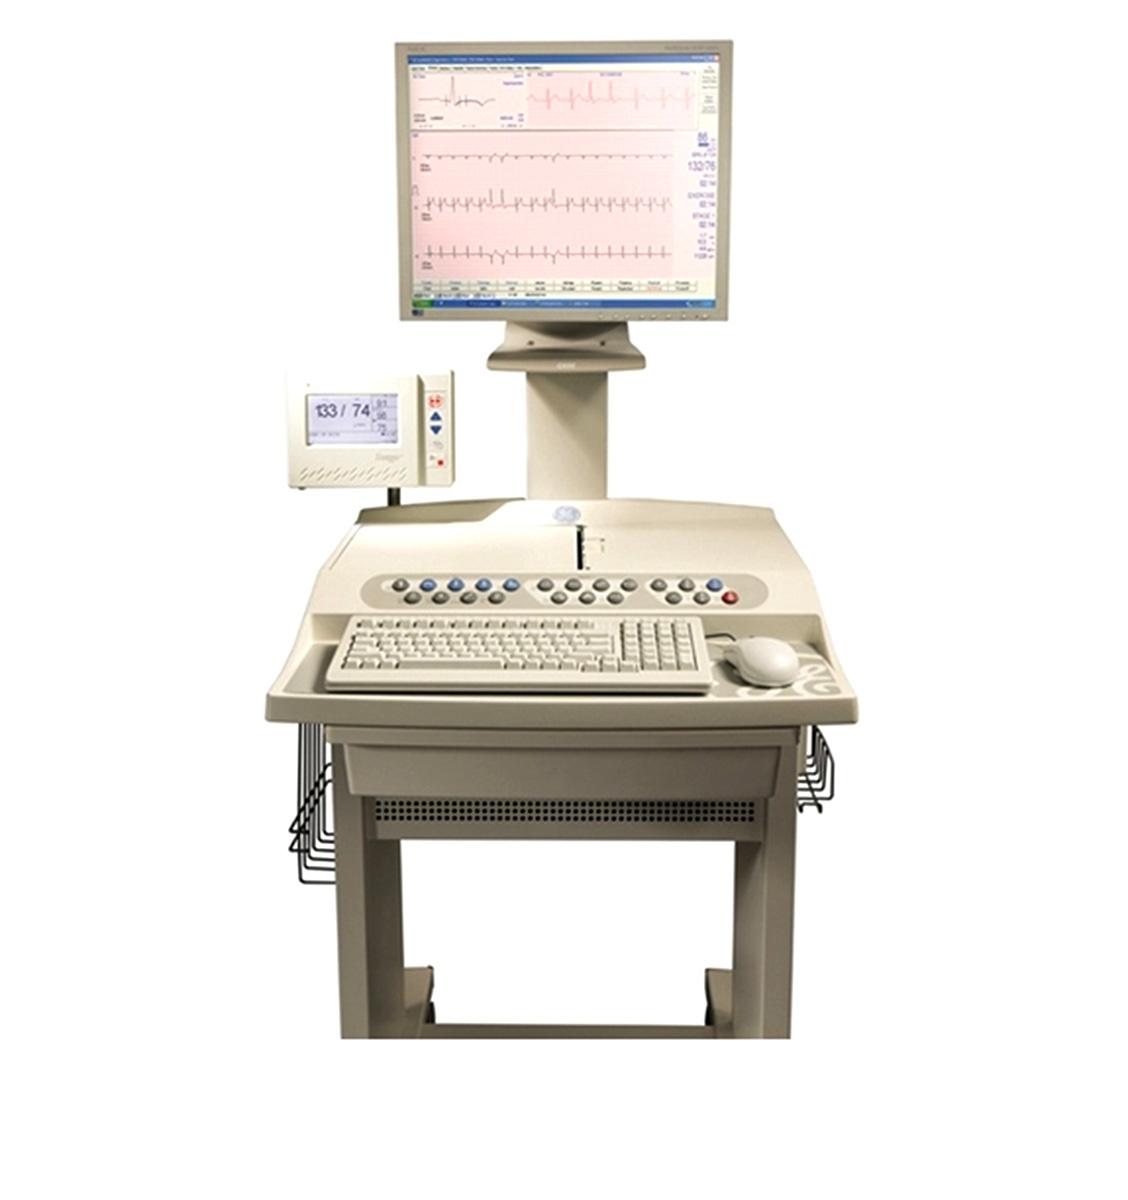 Stress Test Algorithm: Buy GE Healthcare CASE Stress Exercise Testing System